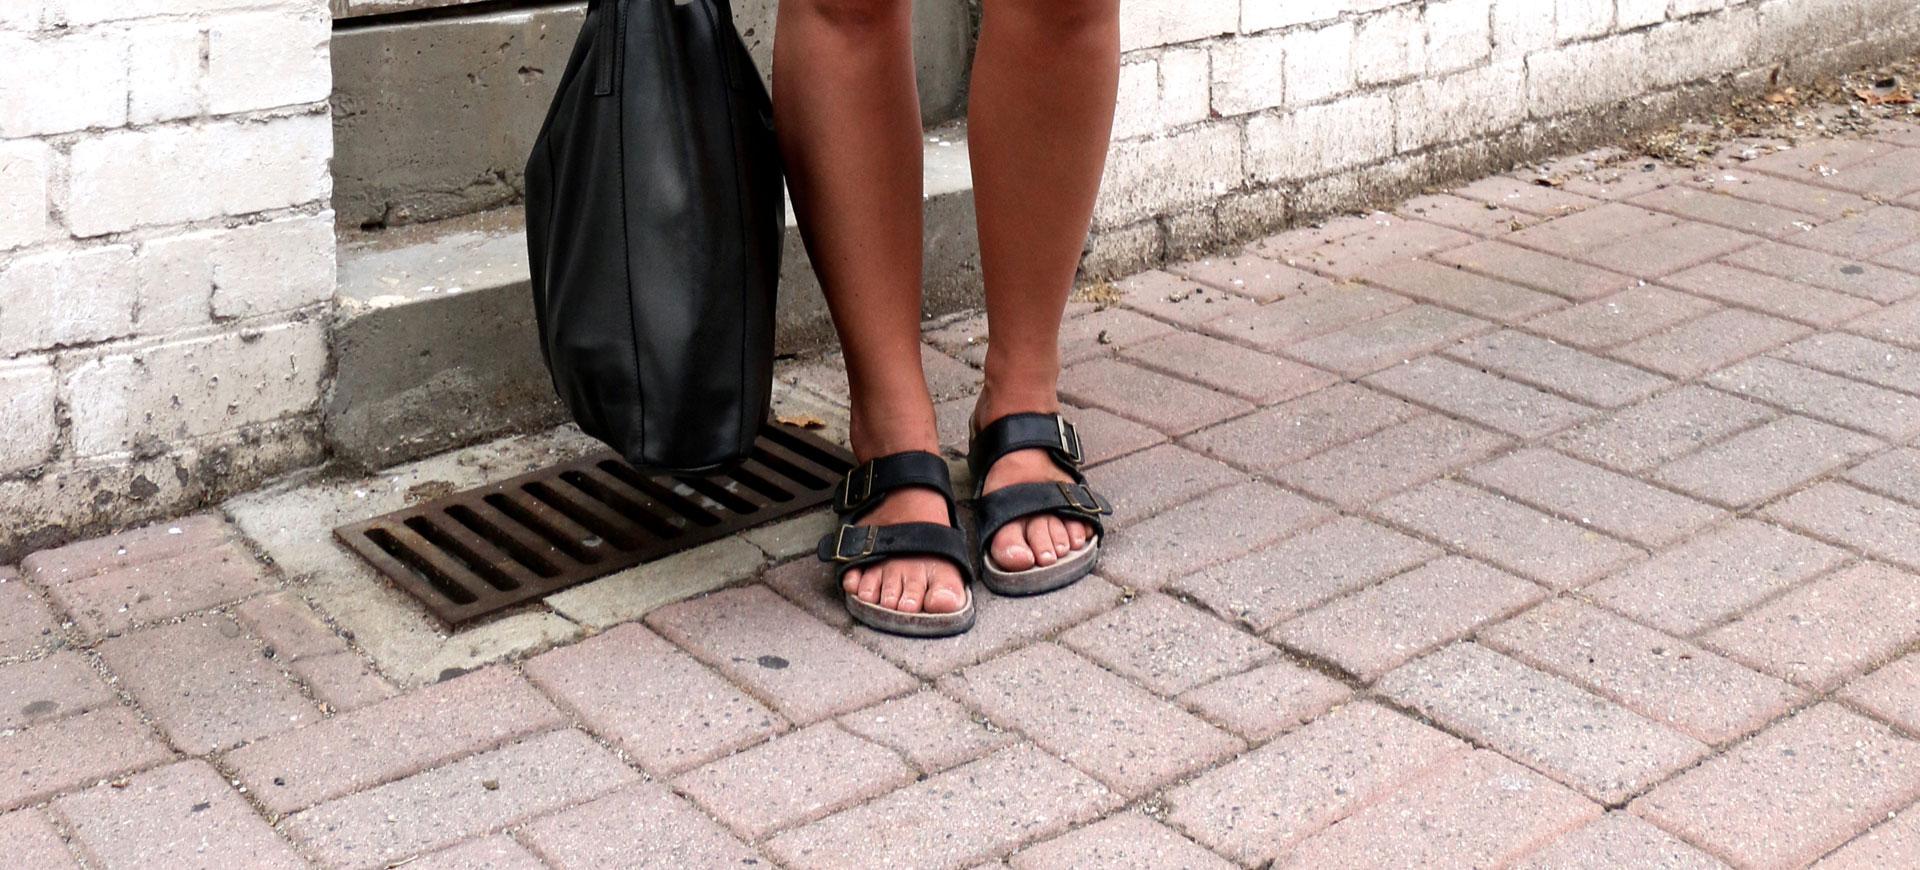 Sommarens snyggaste sandaler och tofflor